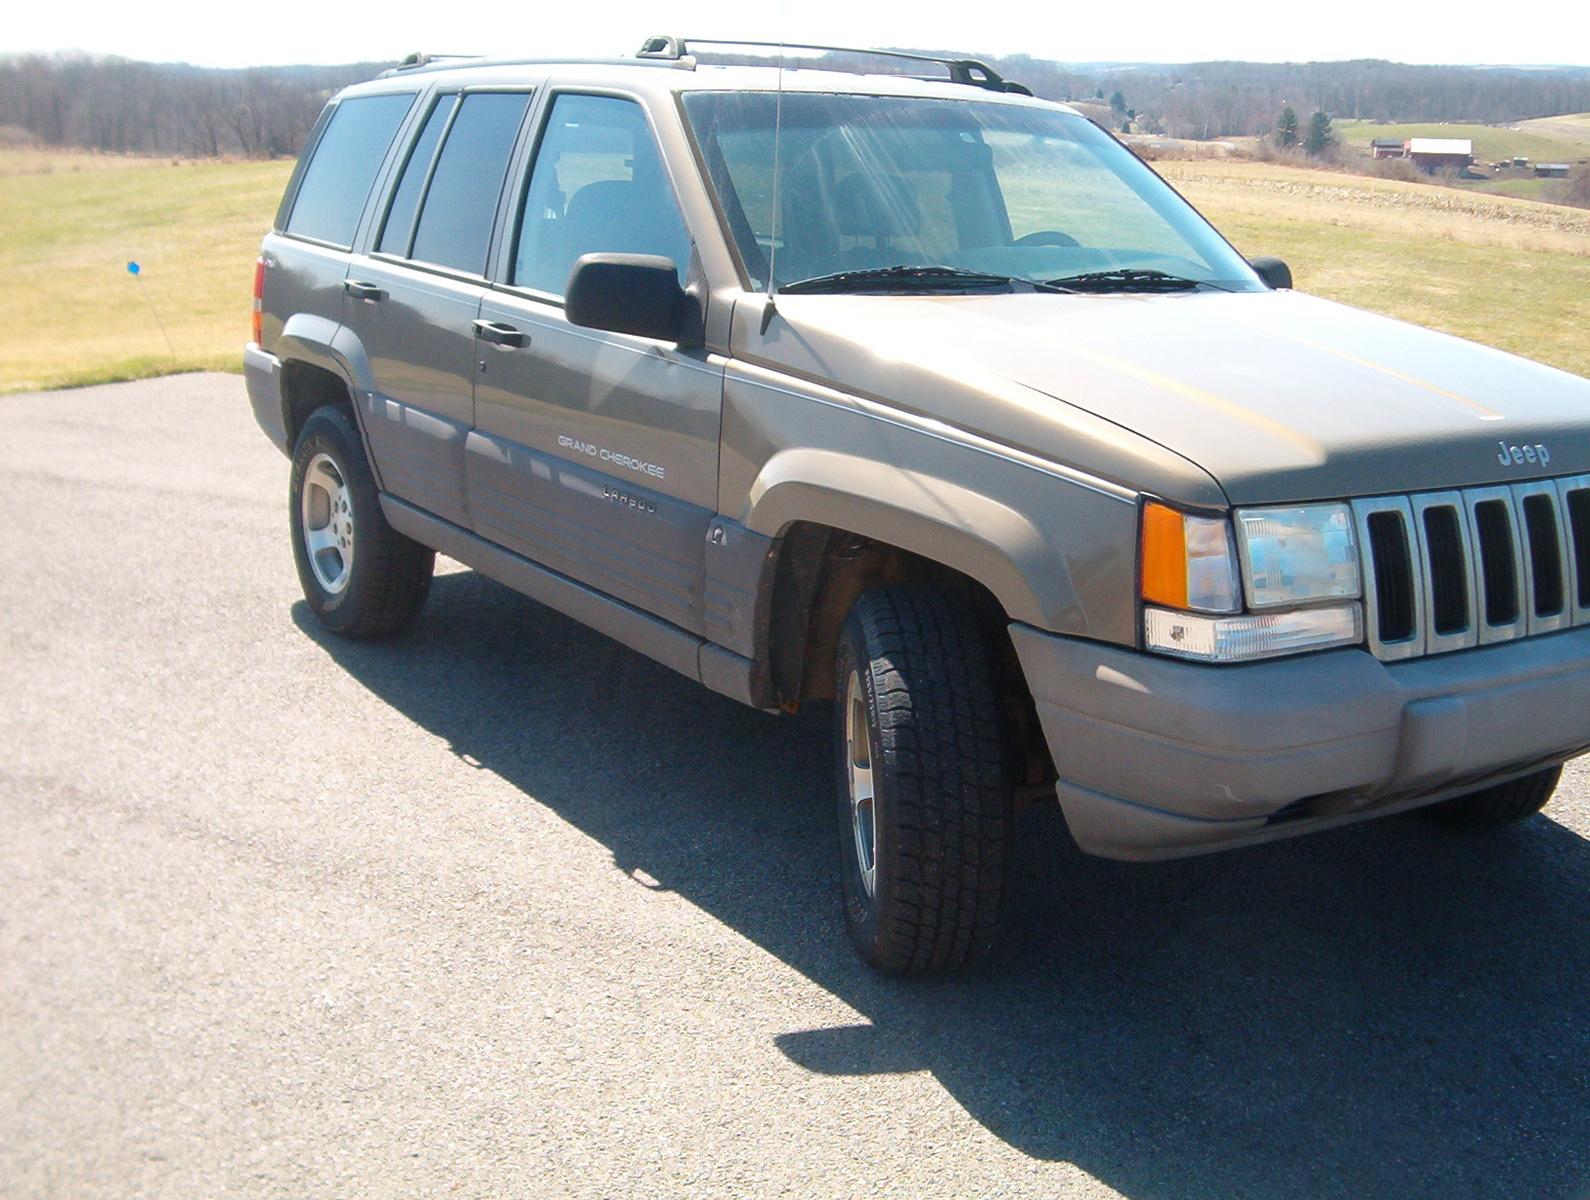 1996 jeep grand cherokee exterior pictures cargurus - 1996 jeep grand cherokee interior ...